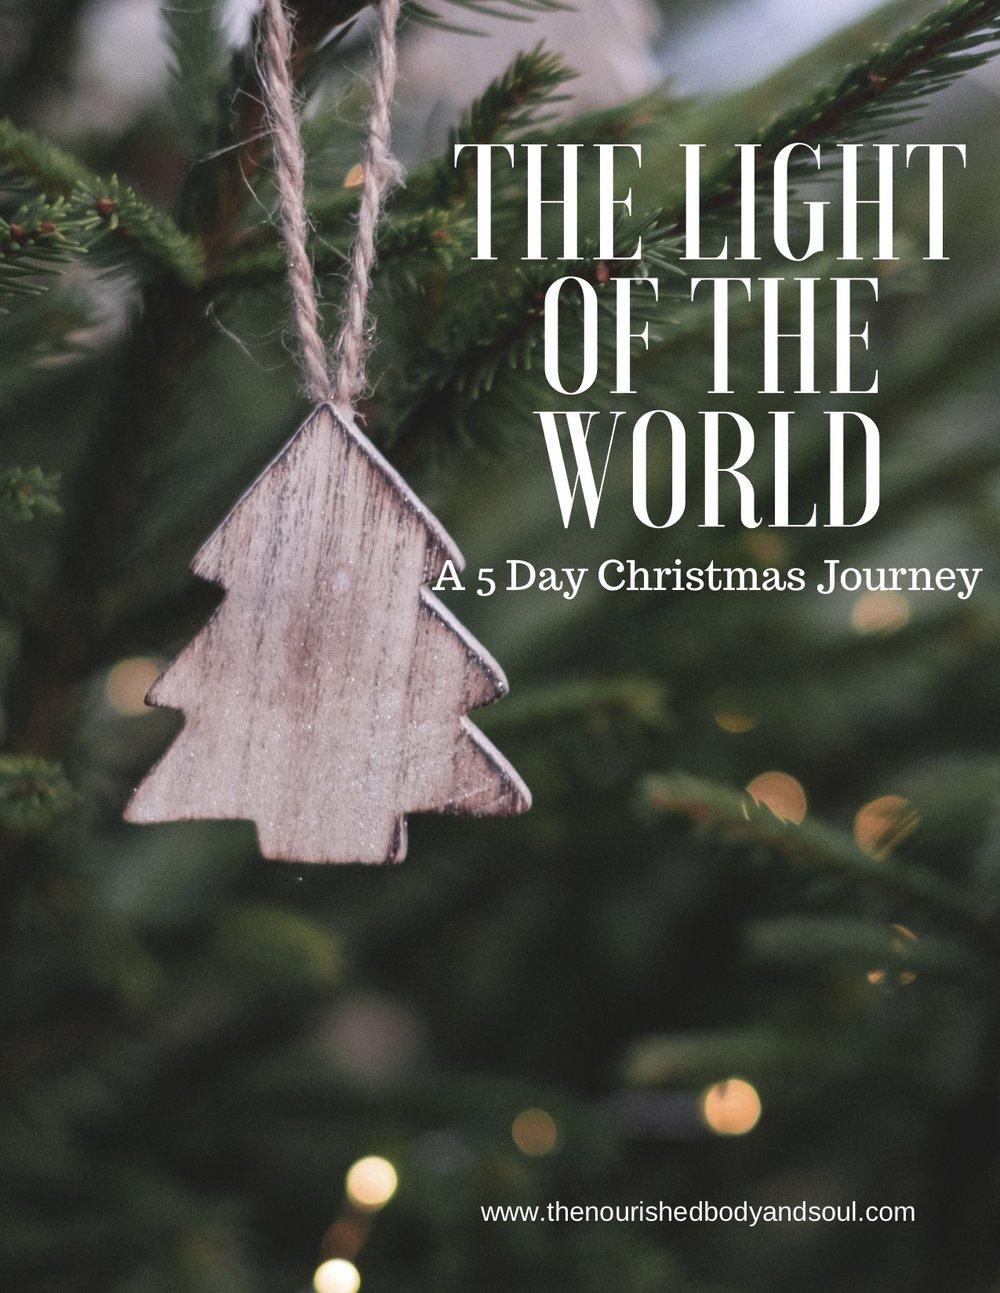 light of the world graphic.jpg